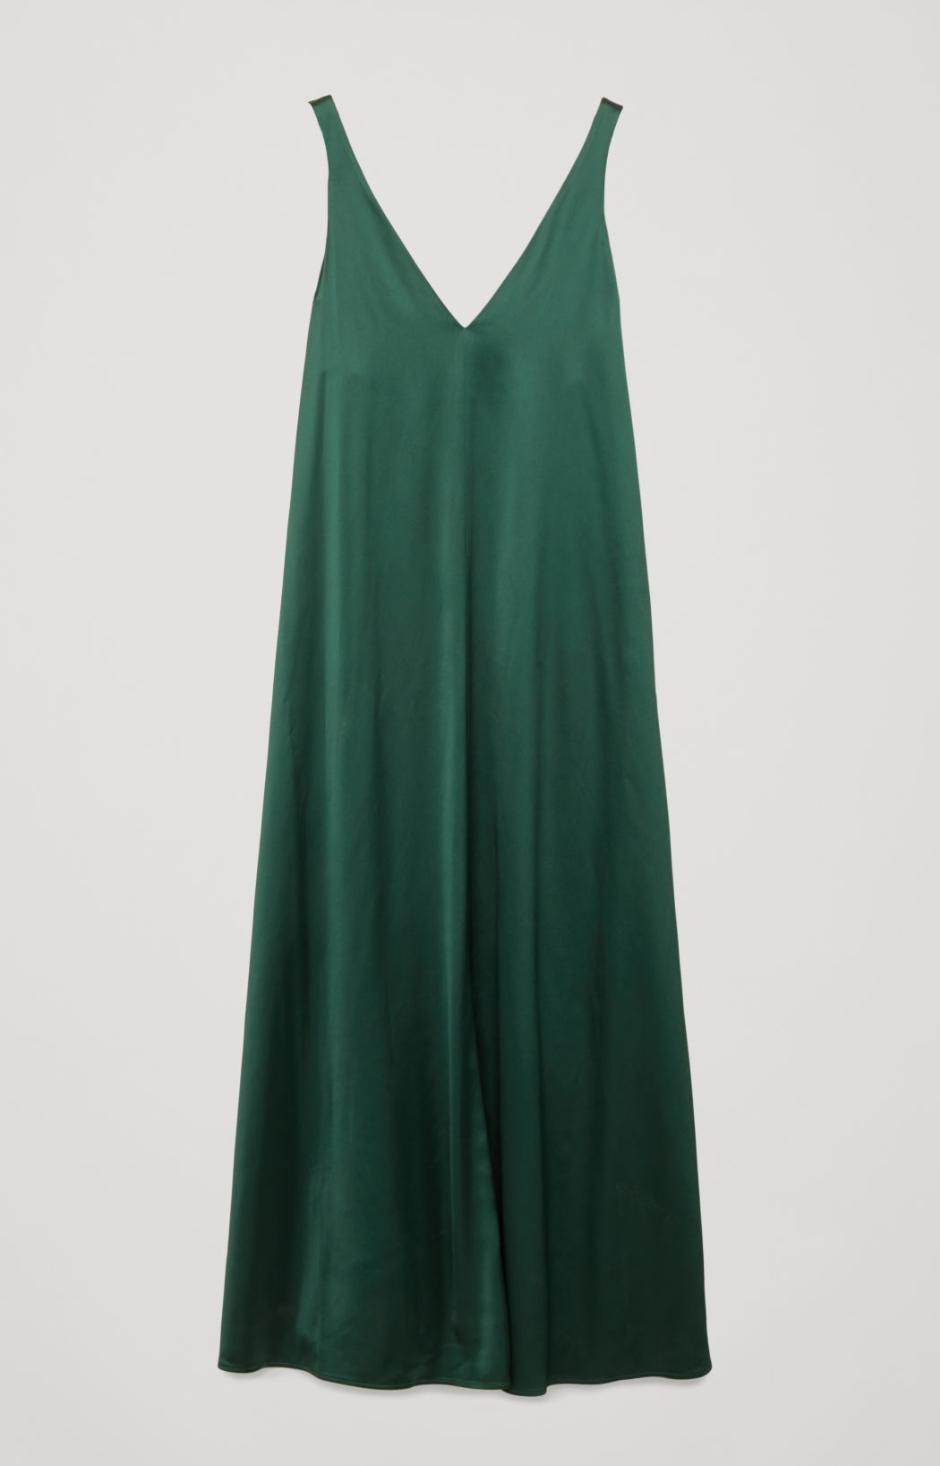 COS Green Satin Dress